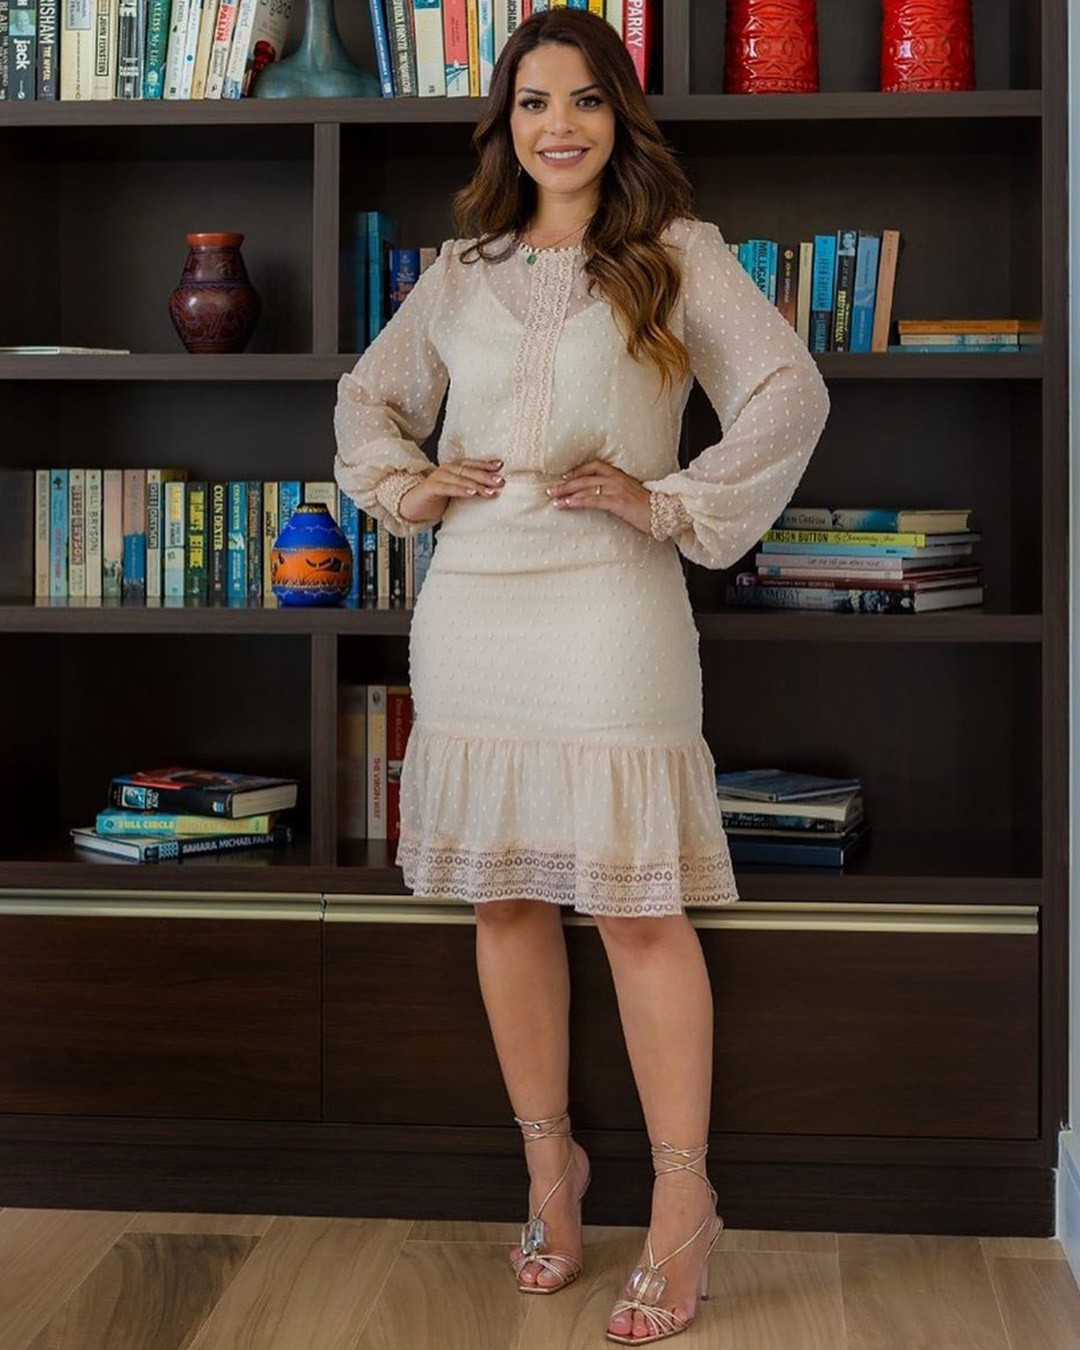 Vestido Midi Chiffon Poá com Renda Manga Longa cor Creme Az Irmãs